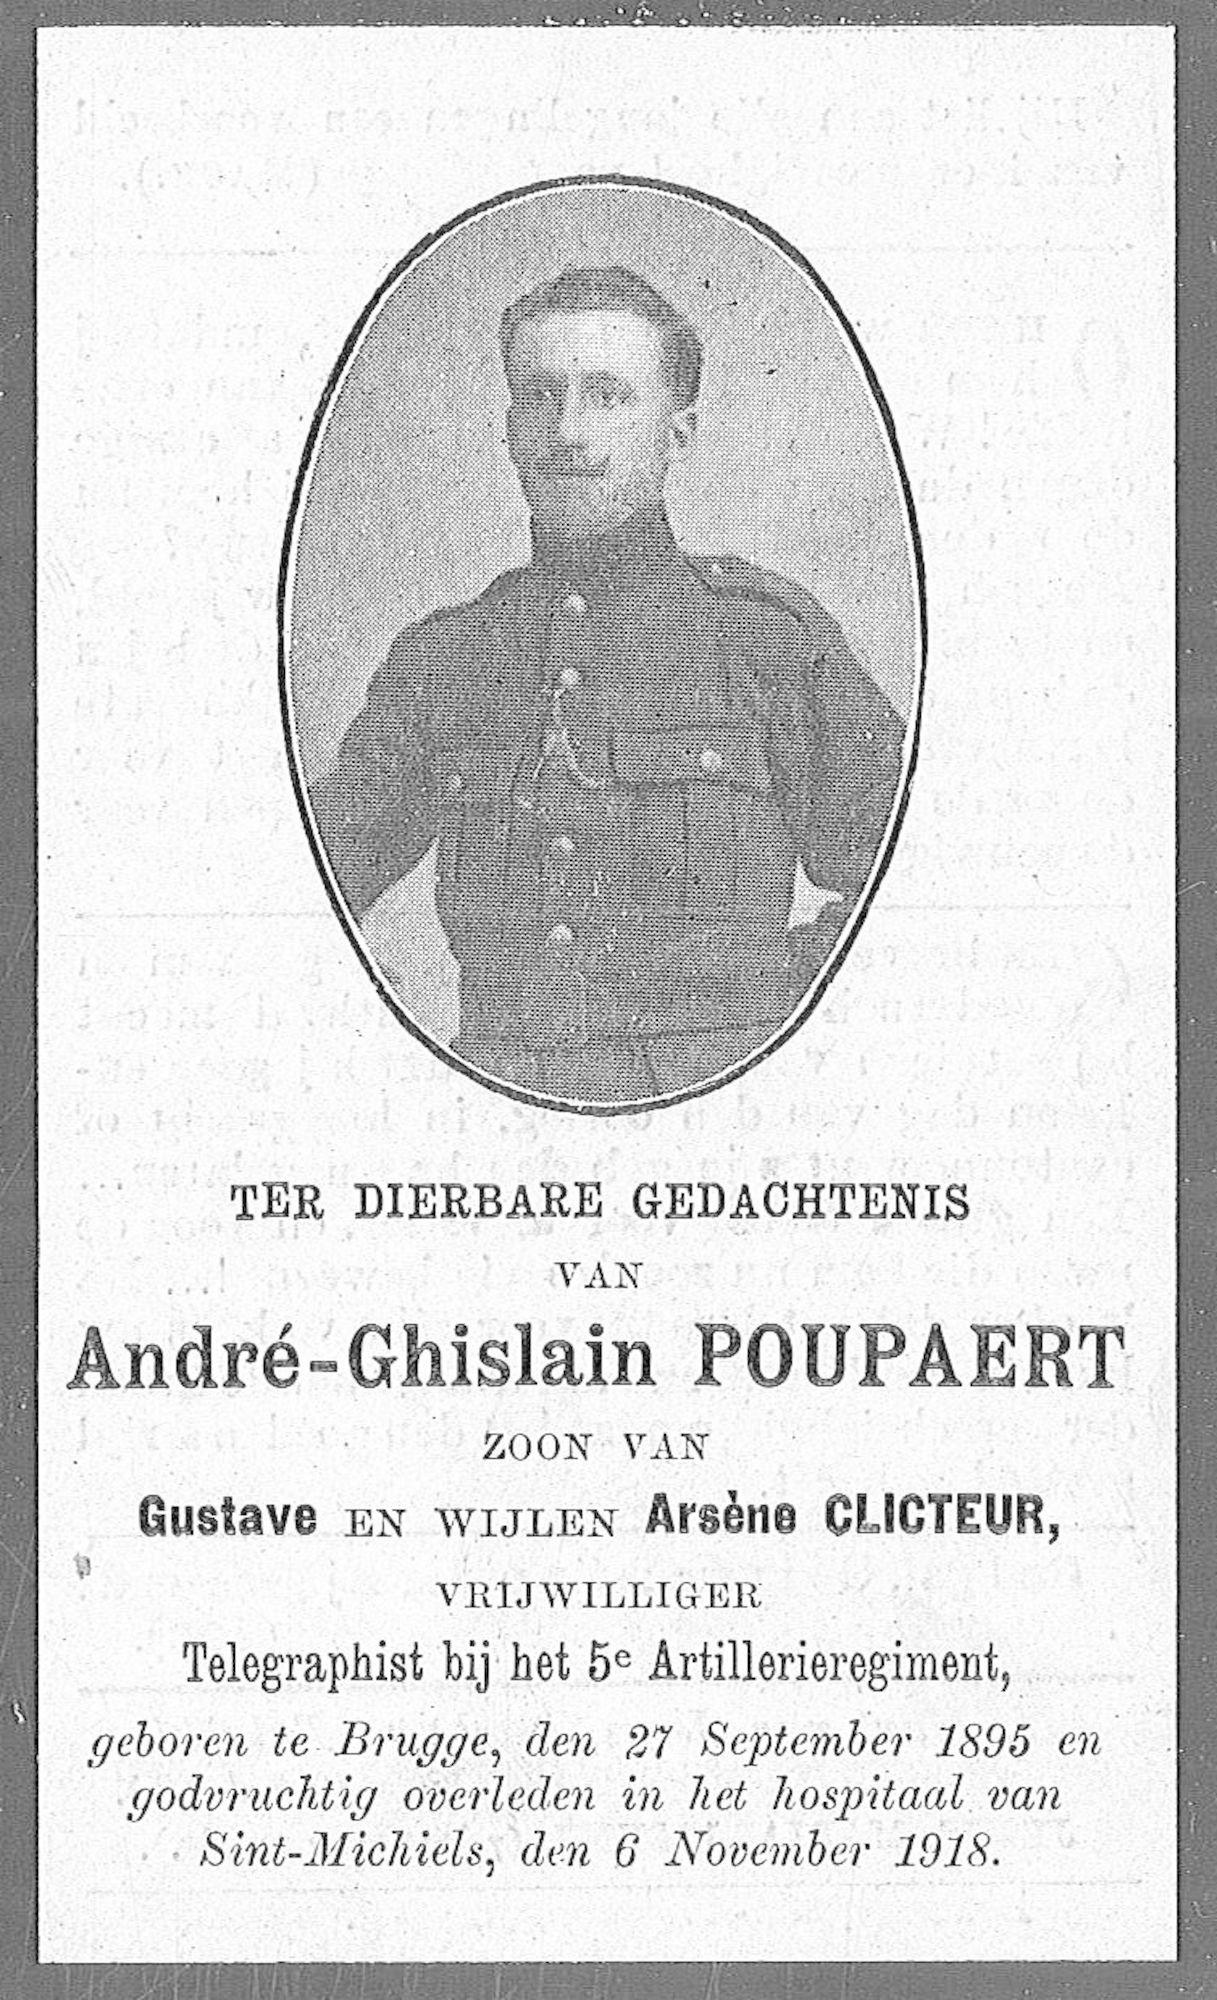 André-Ghislain Poupaert